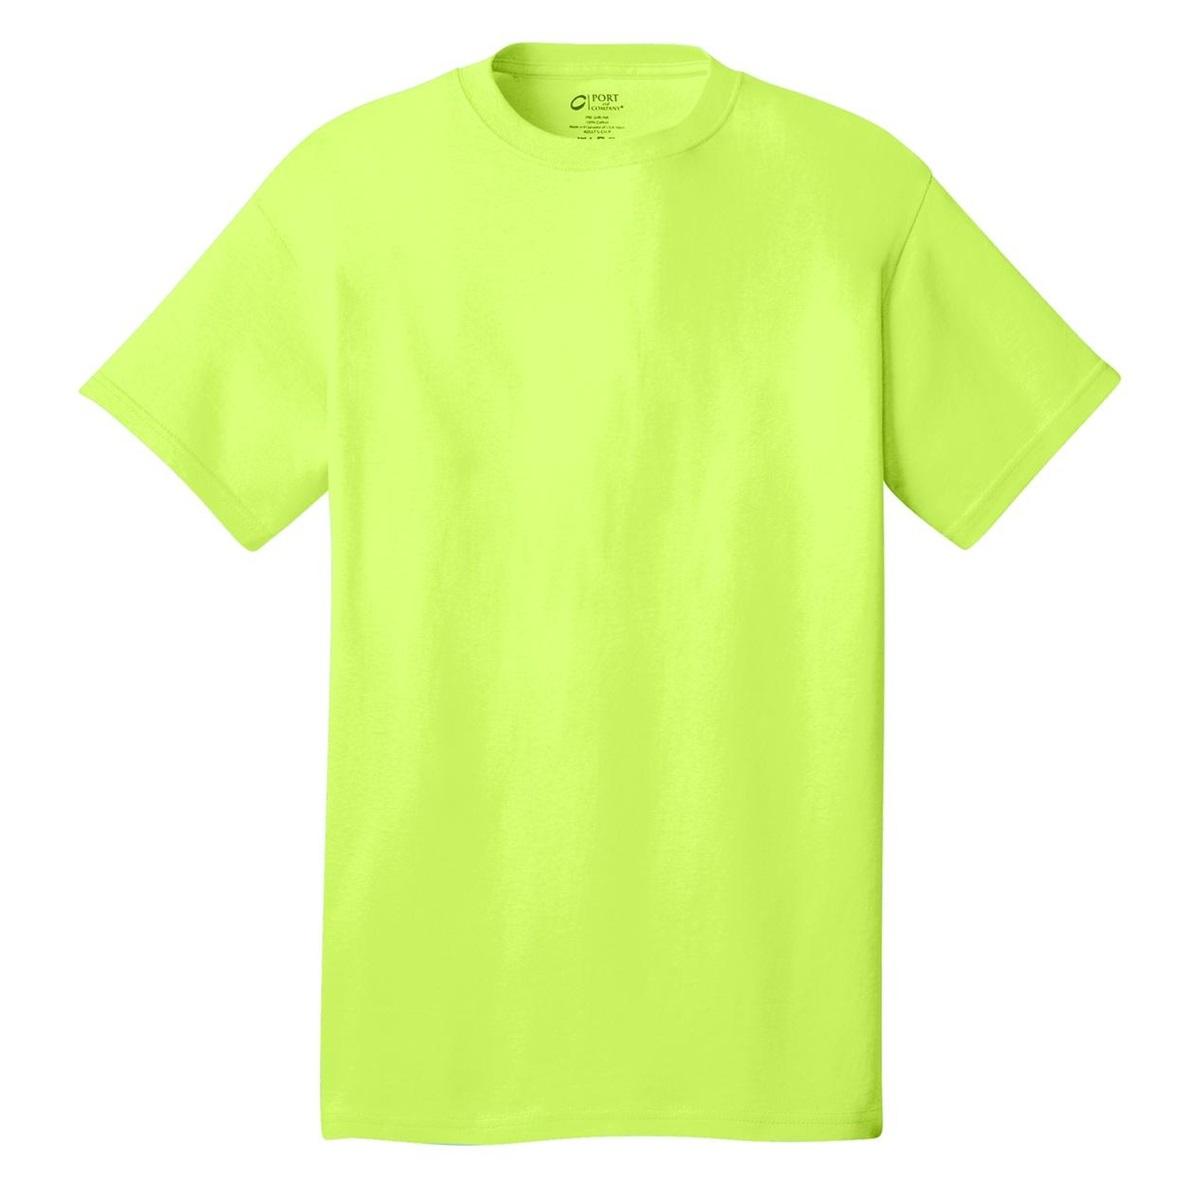 Port Company Pc54 5 4 Oz 100 Cotton T Shirt Neon